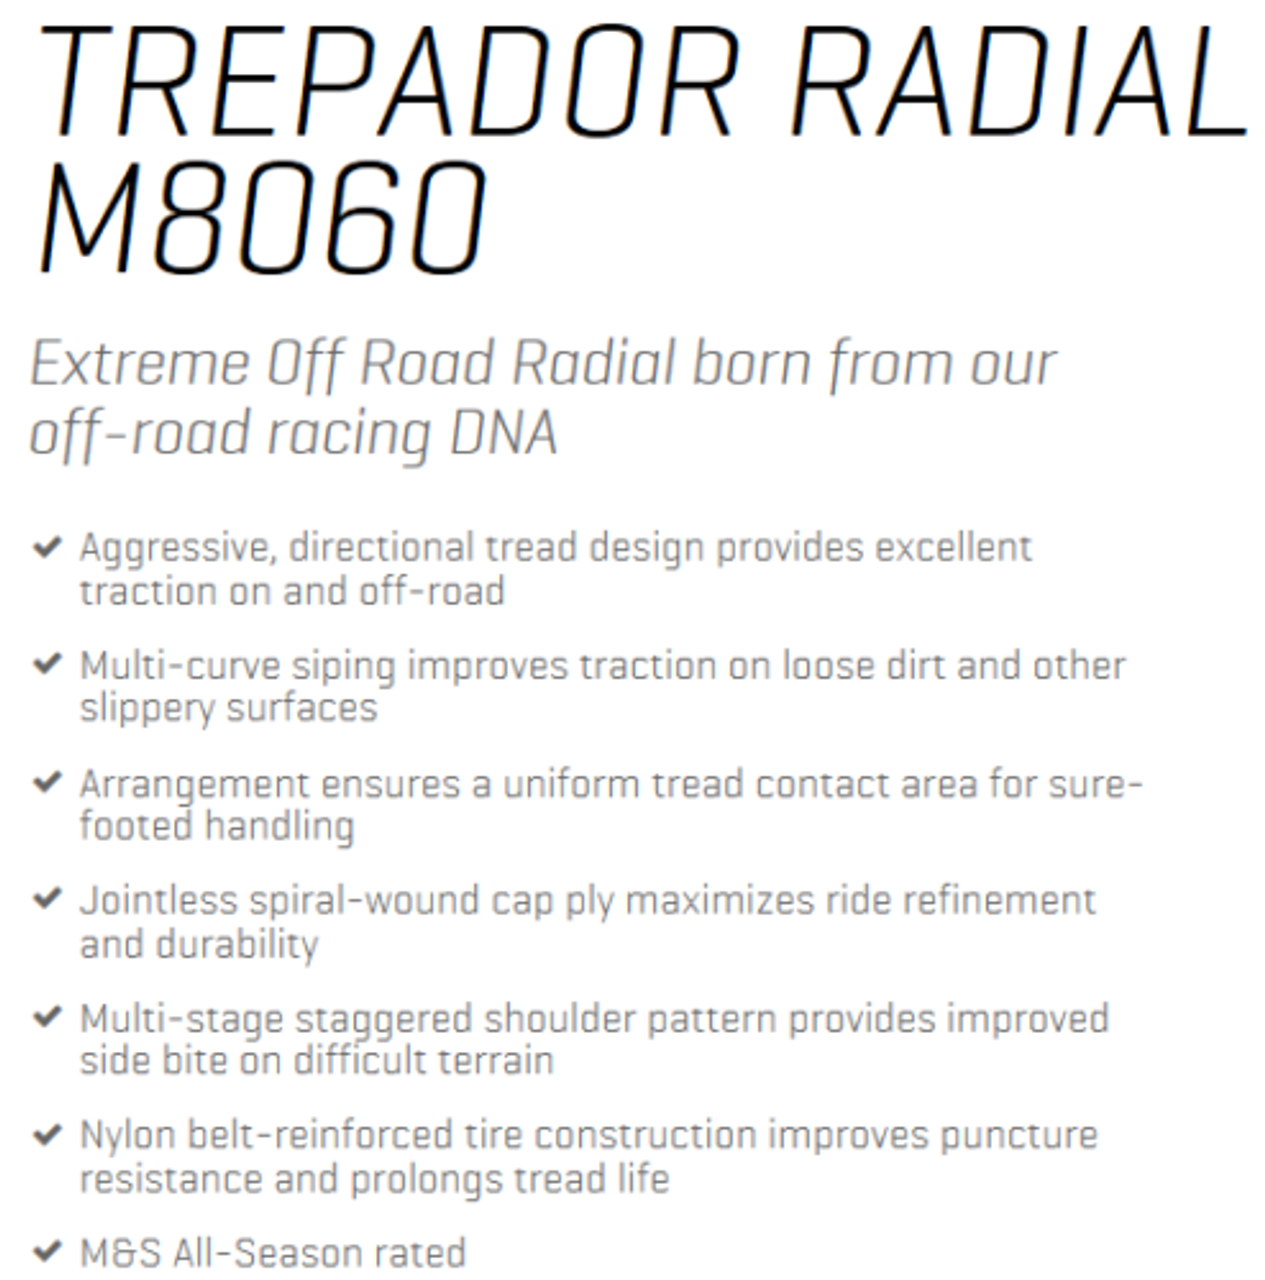 New Tire 42 14.50 17 Maxxis Trepador Bias 6 Ply M8060 Mud 42x14.50-17